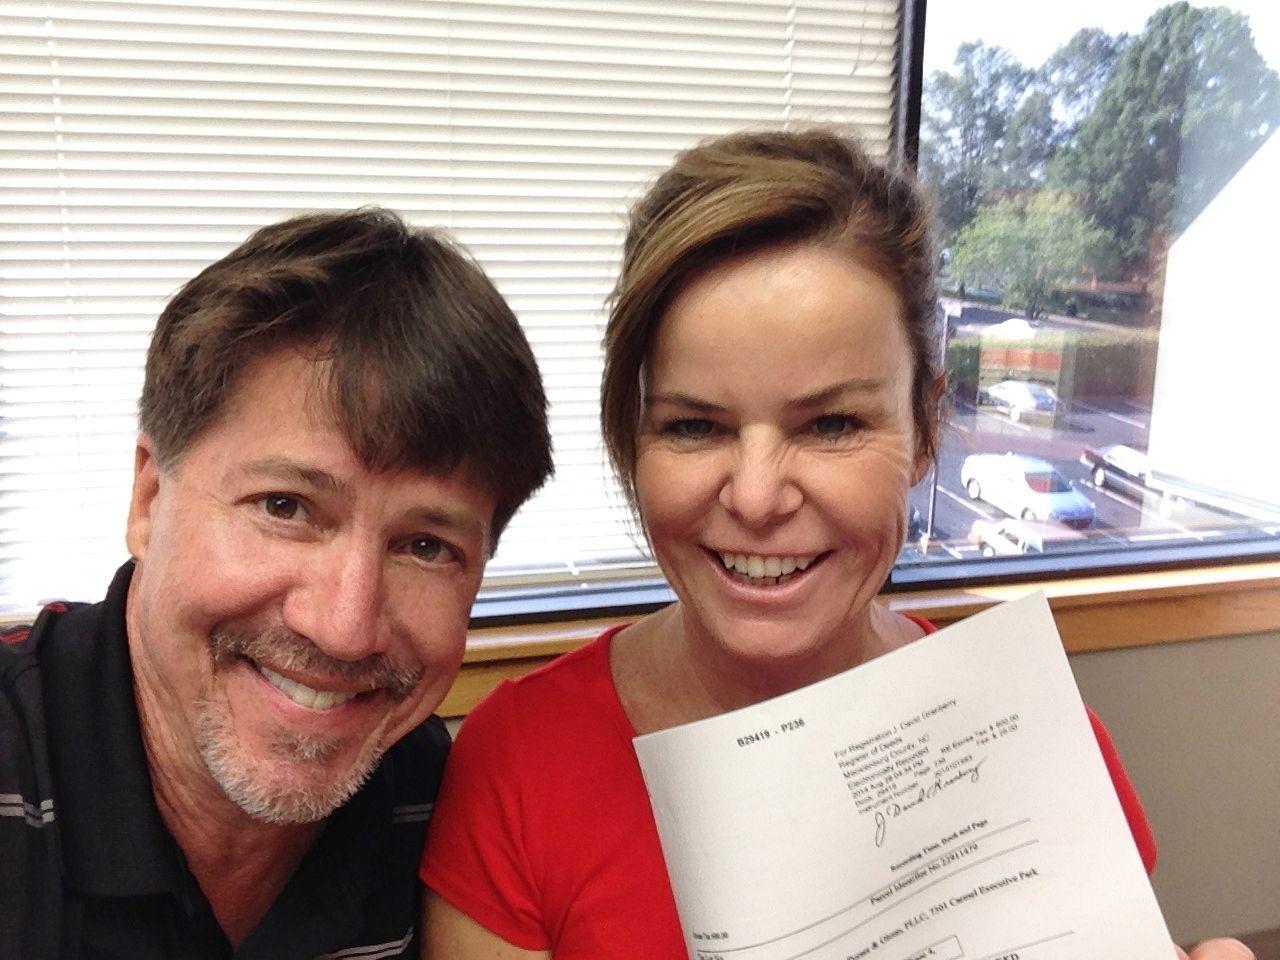 Congratulations to Jennifer!